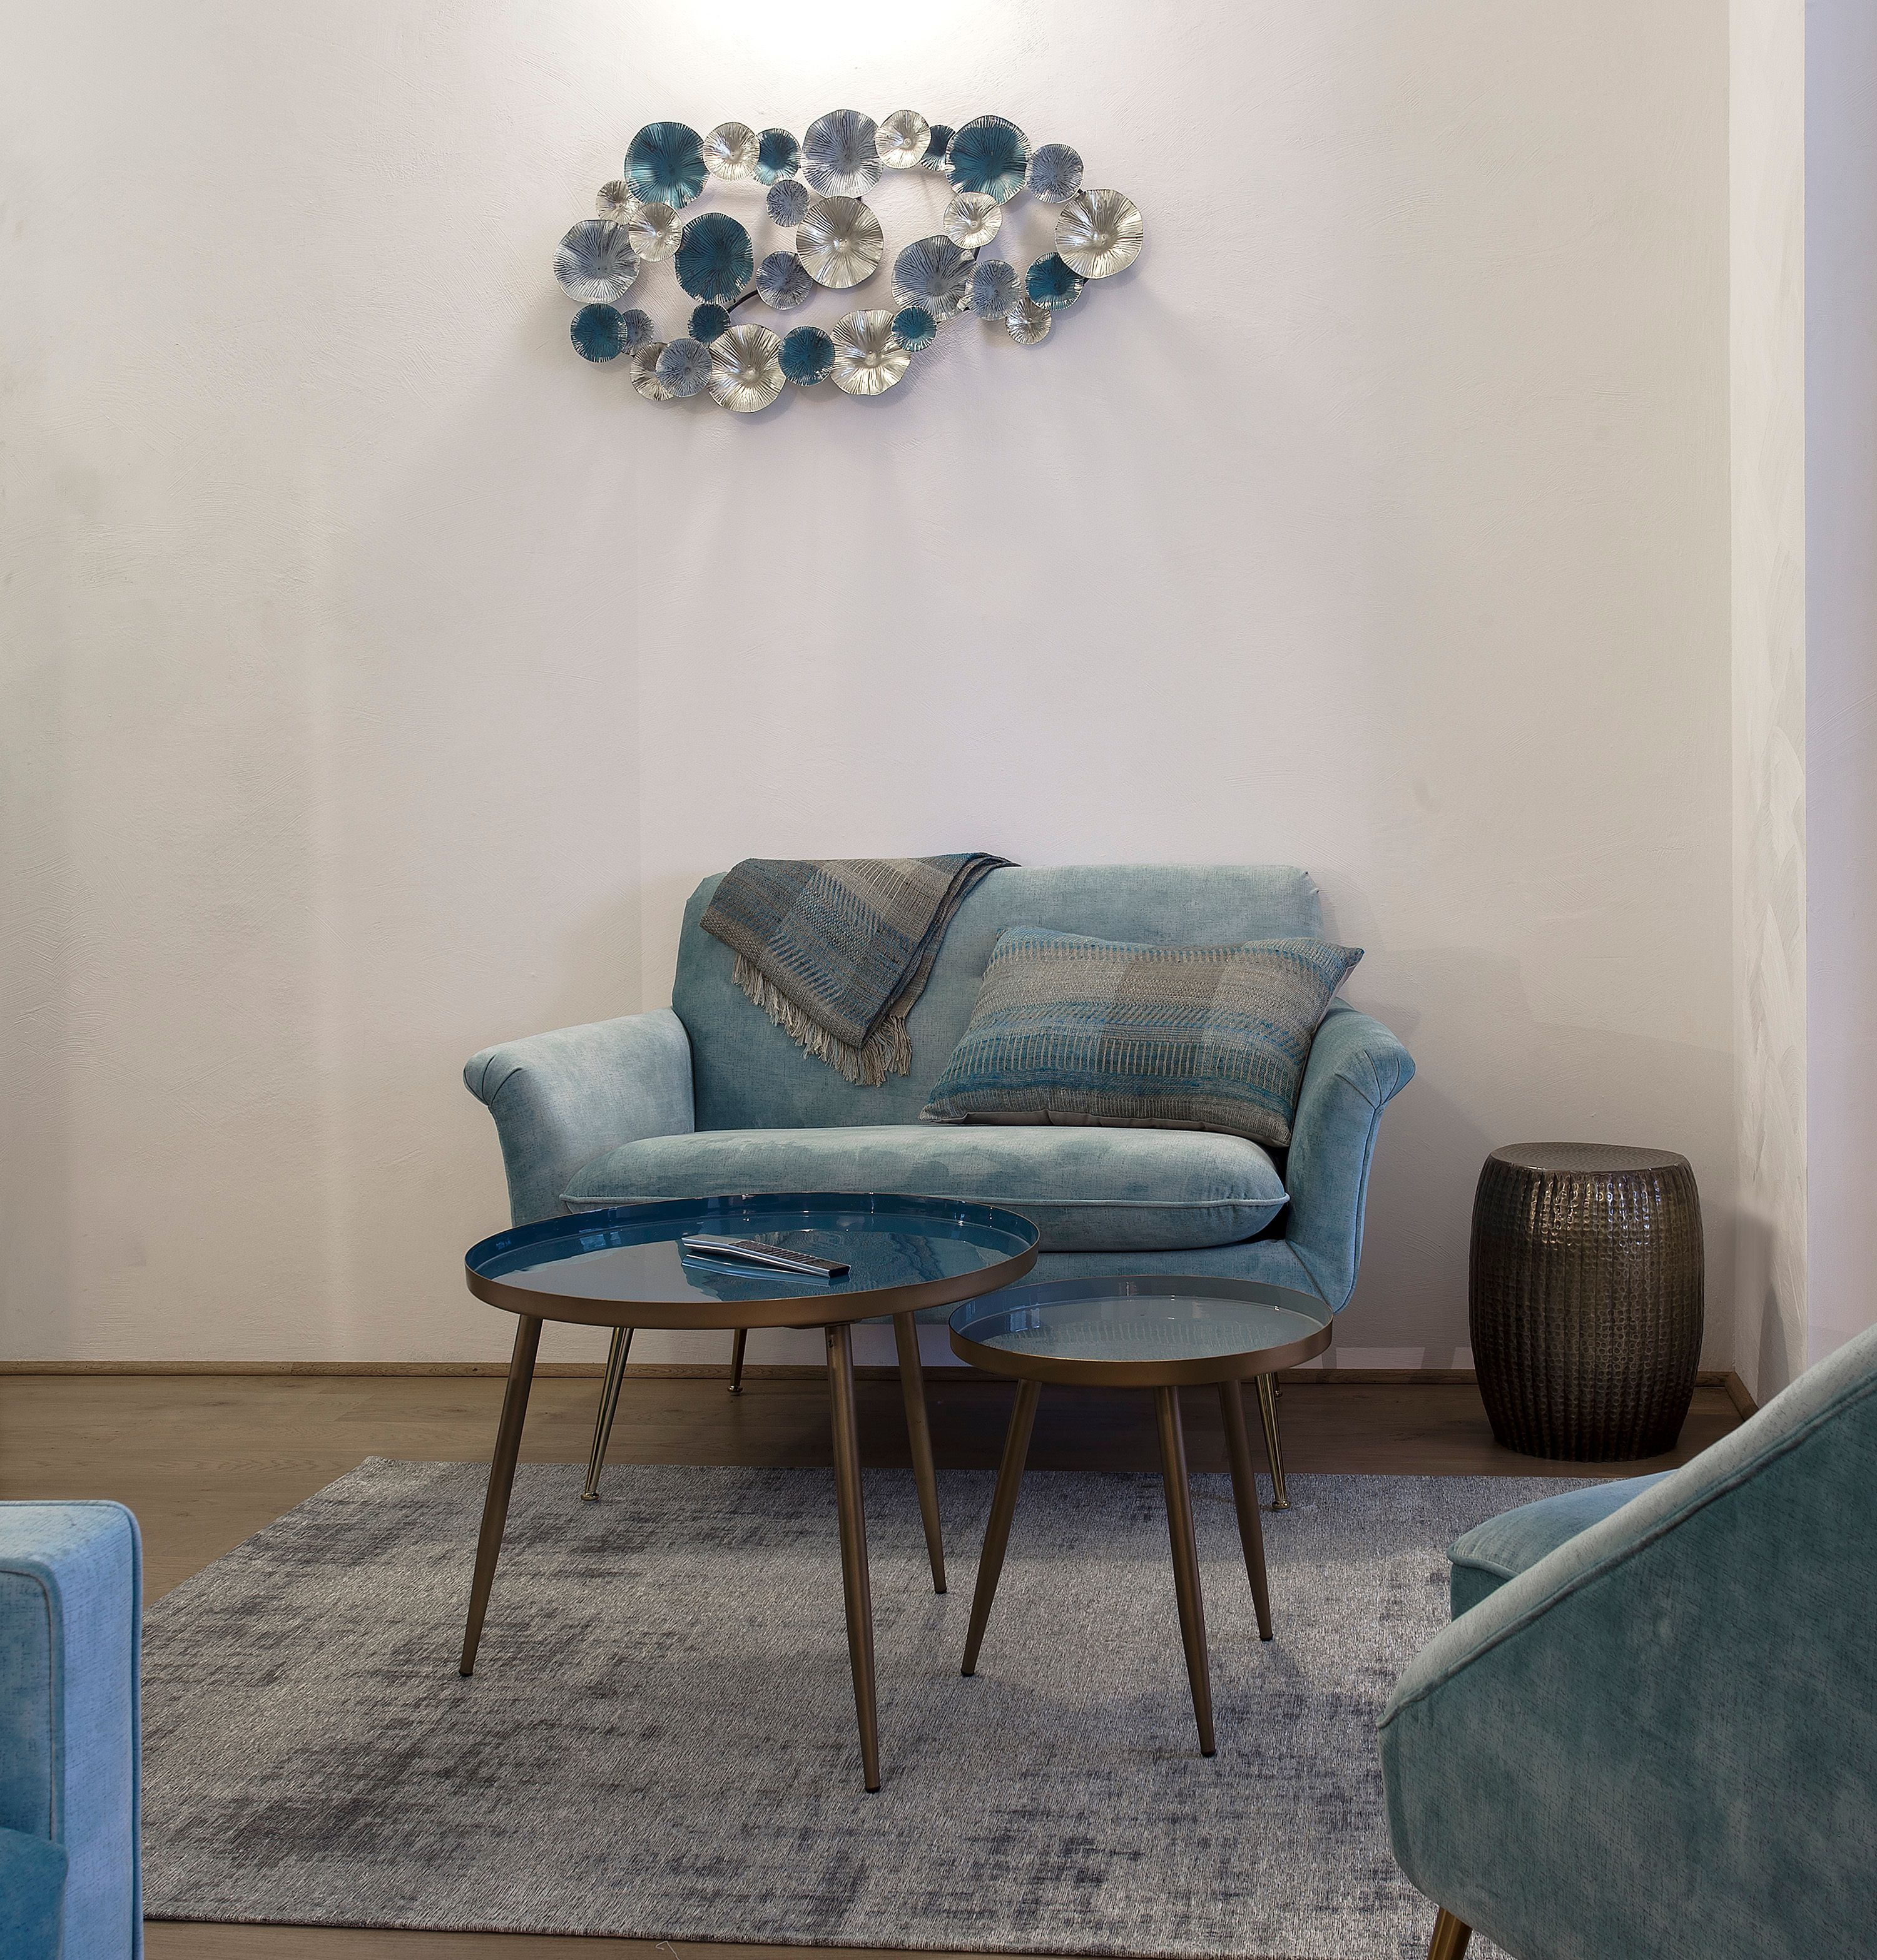 appart-hotel-angouleme-studio-cote-cour-salon-sofa